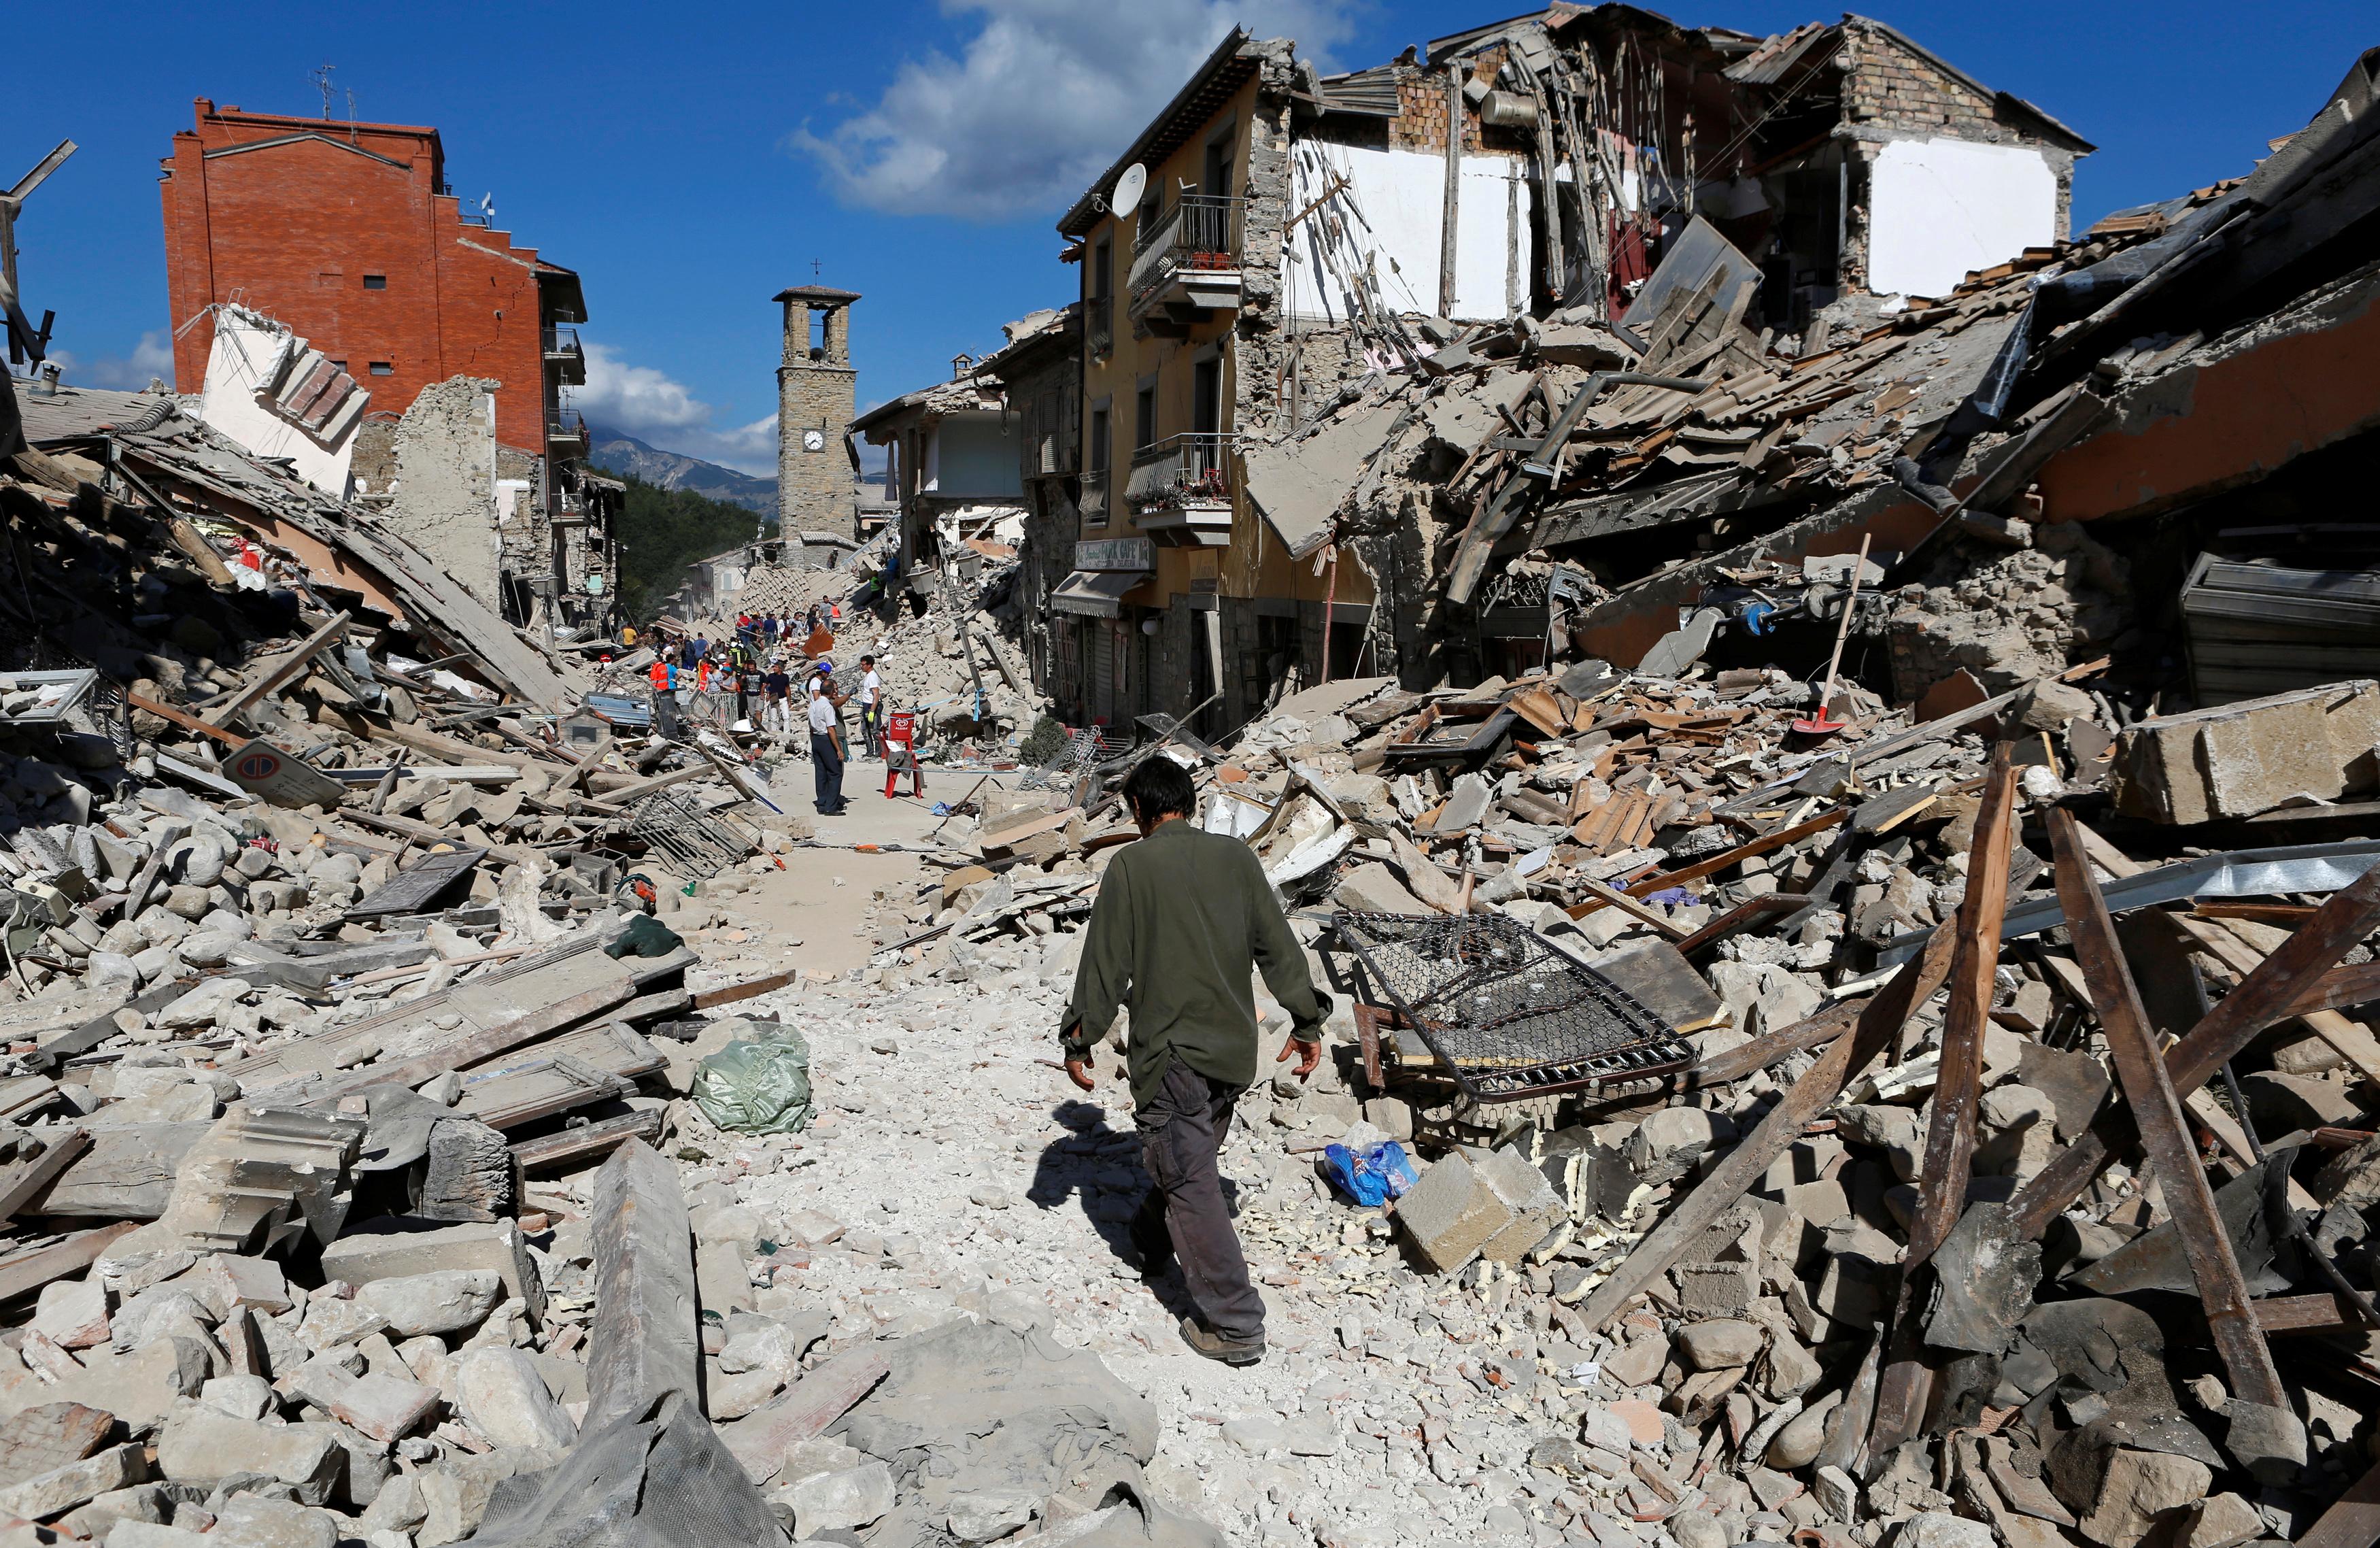 A man walks through the rubble following a 6.2-magnitude earthquake in Pescara del Tronto. Photo by Remo Casilli/Reuters